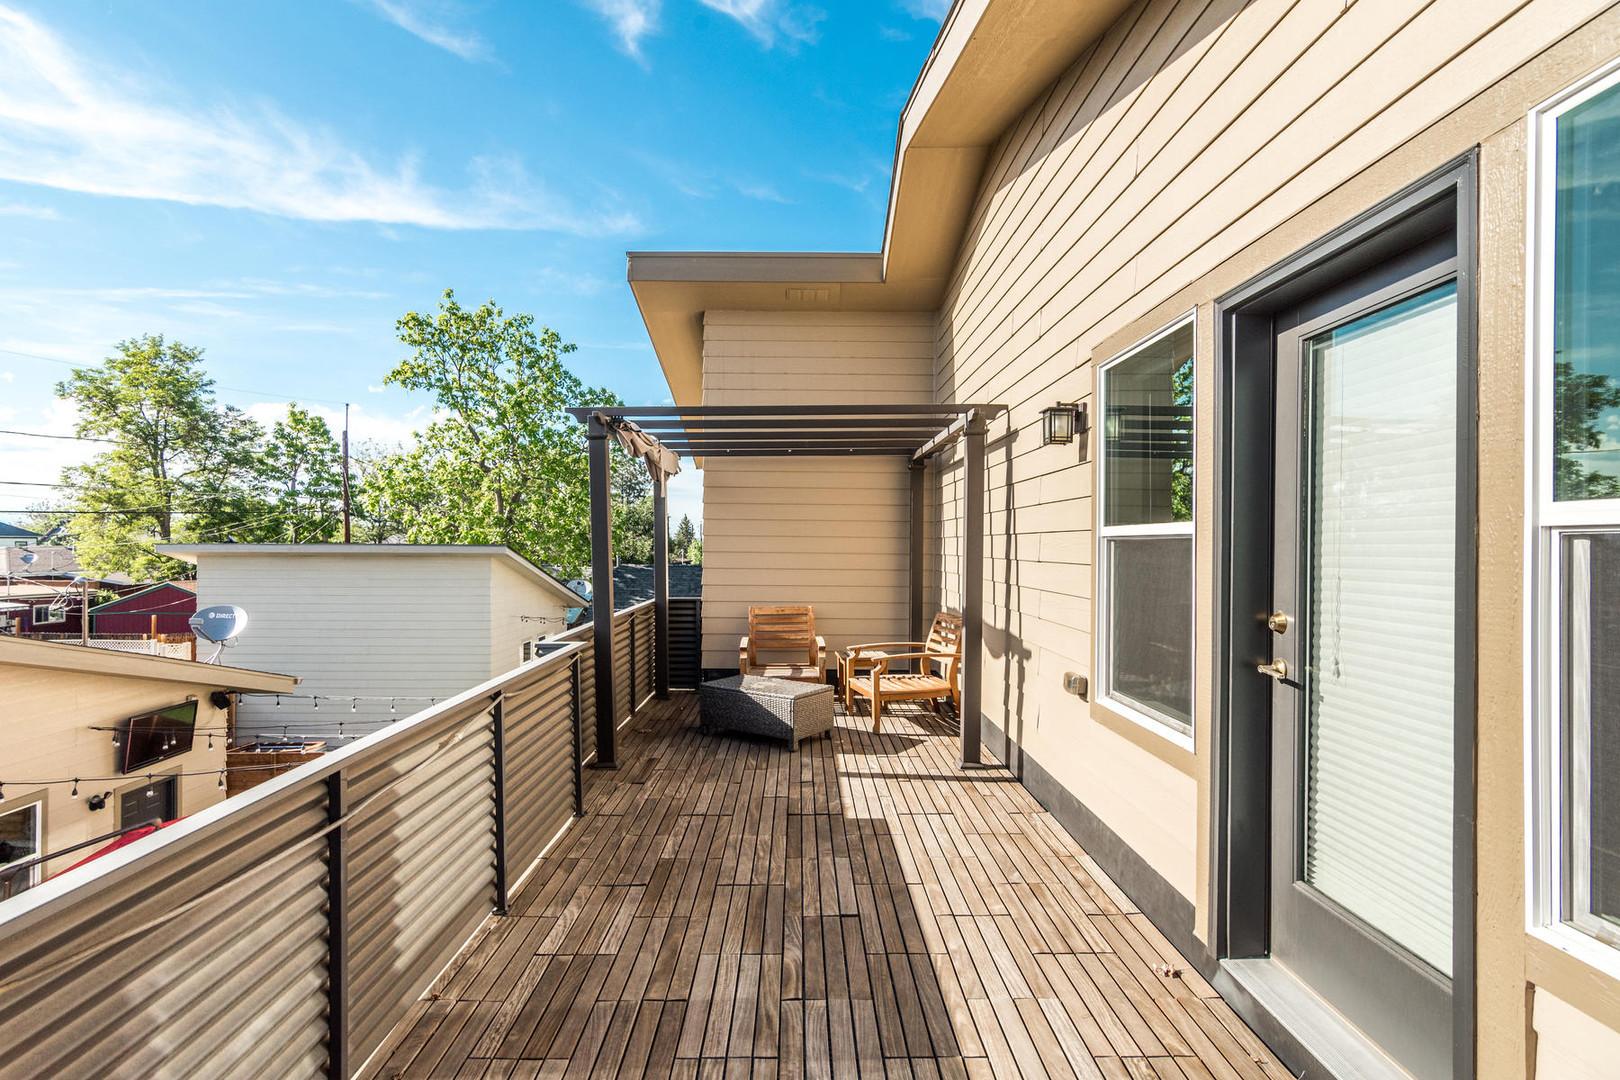 5001 Quitman Street-013-014-Deck-MLS_Siz